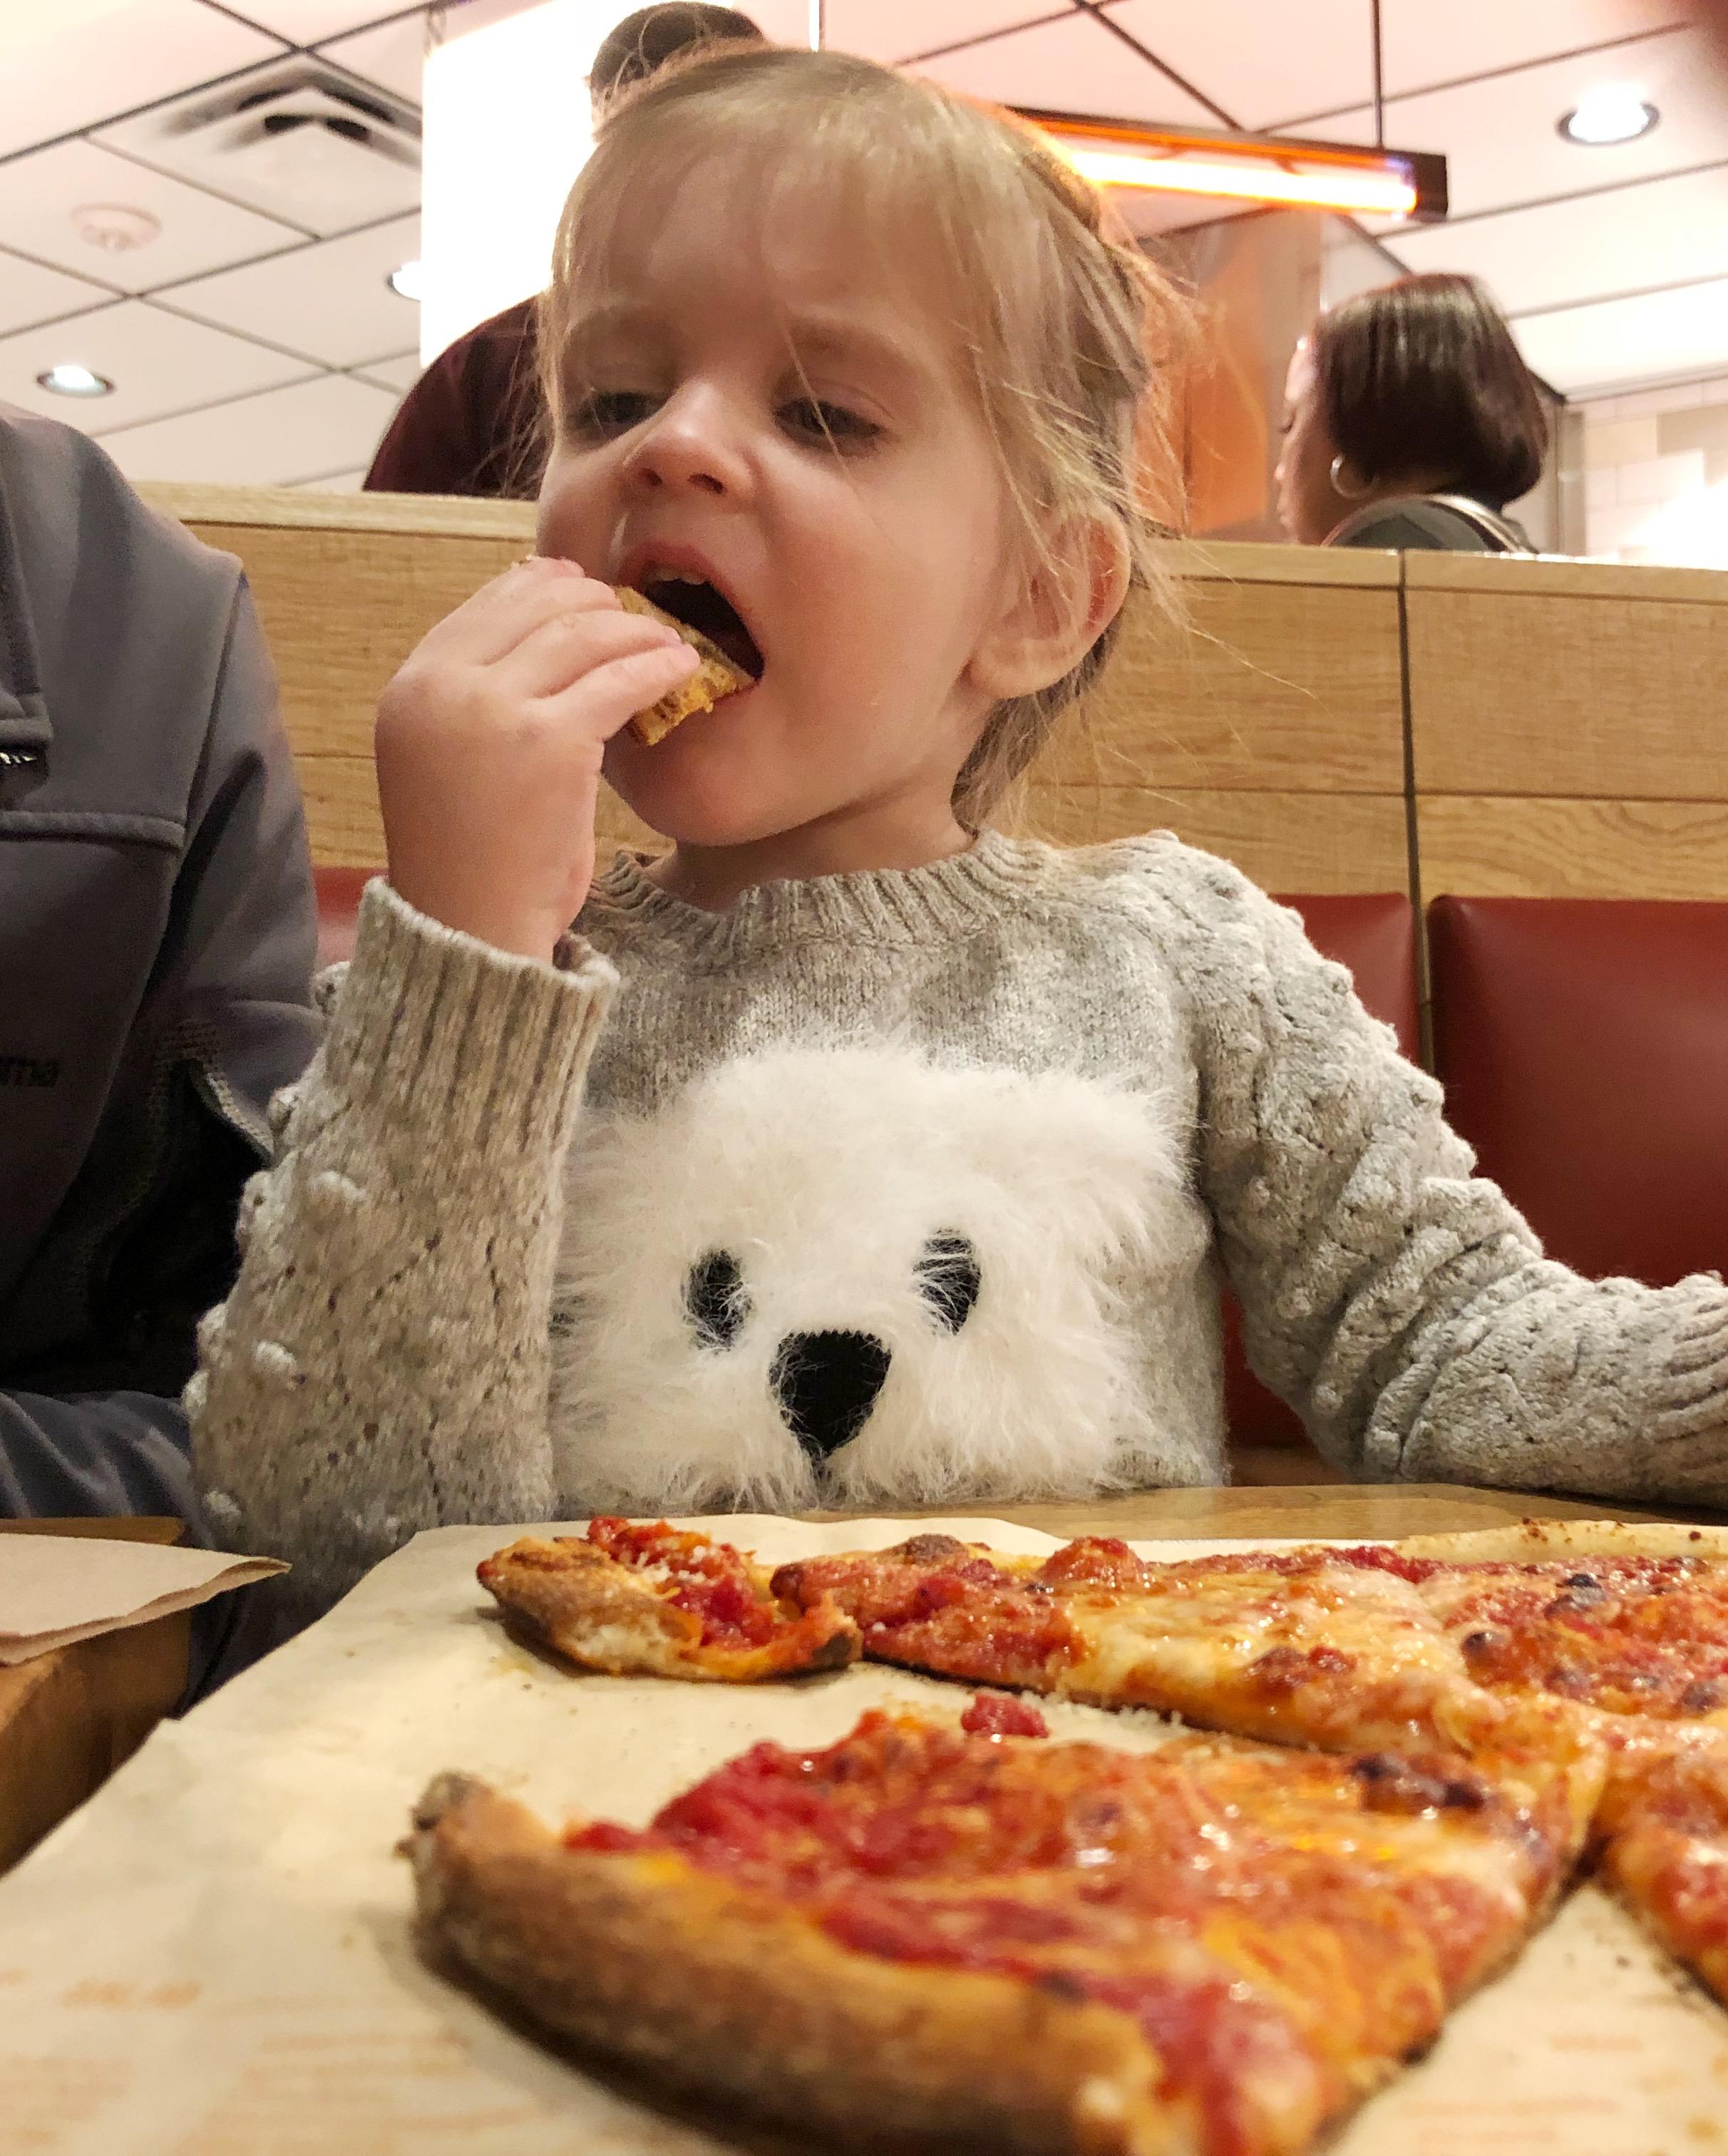 baby-eats-blaze-pizza